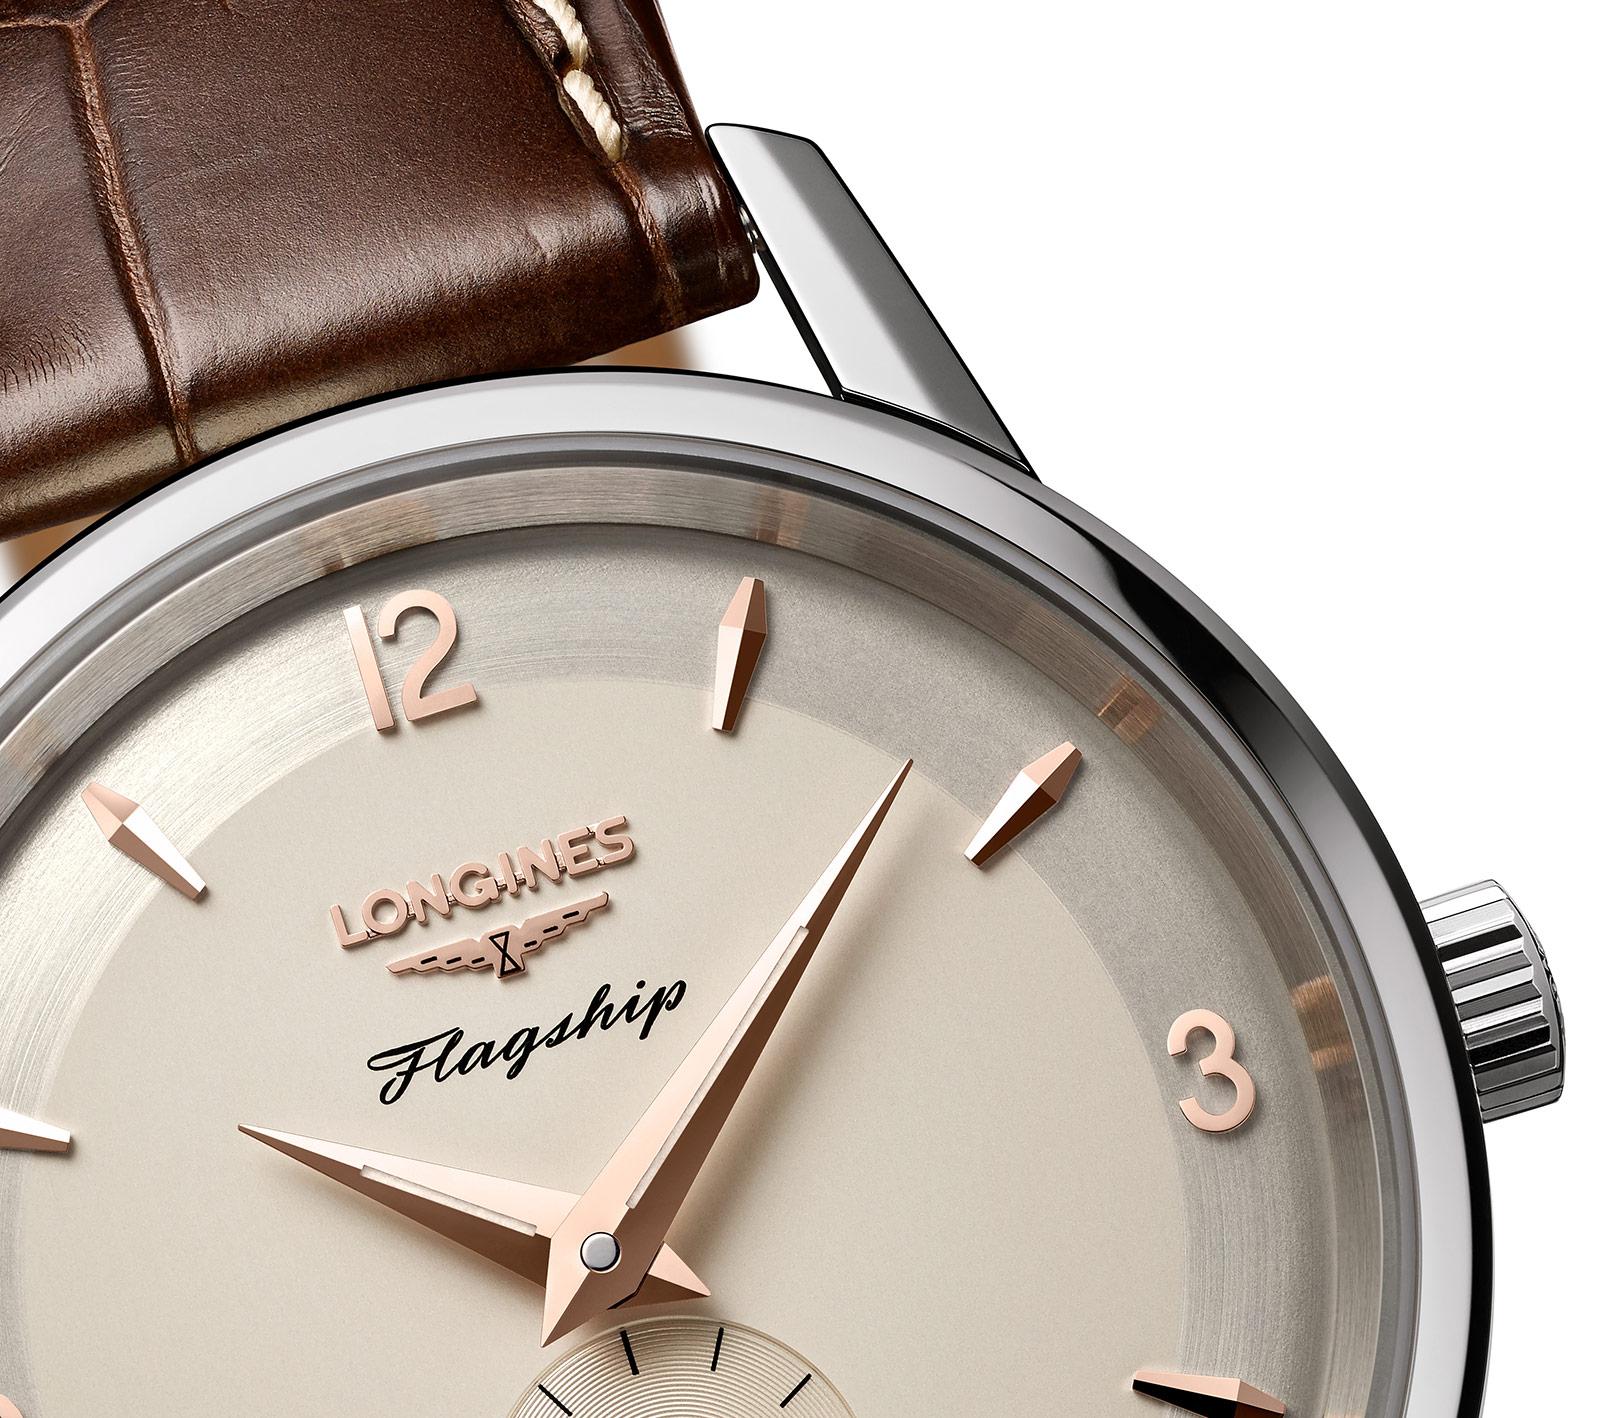 Longines Flagship Heritage 60th Anniversary steel 2